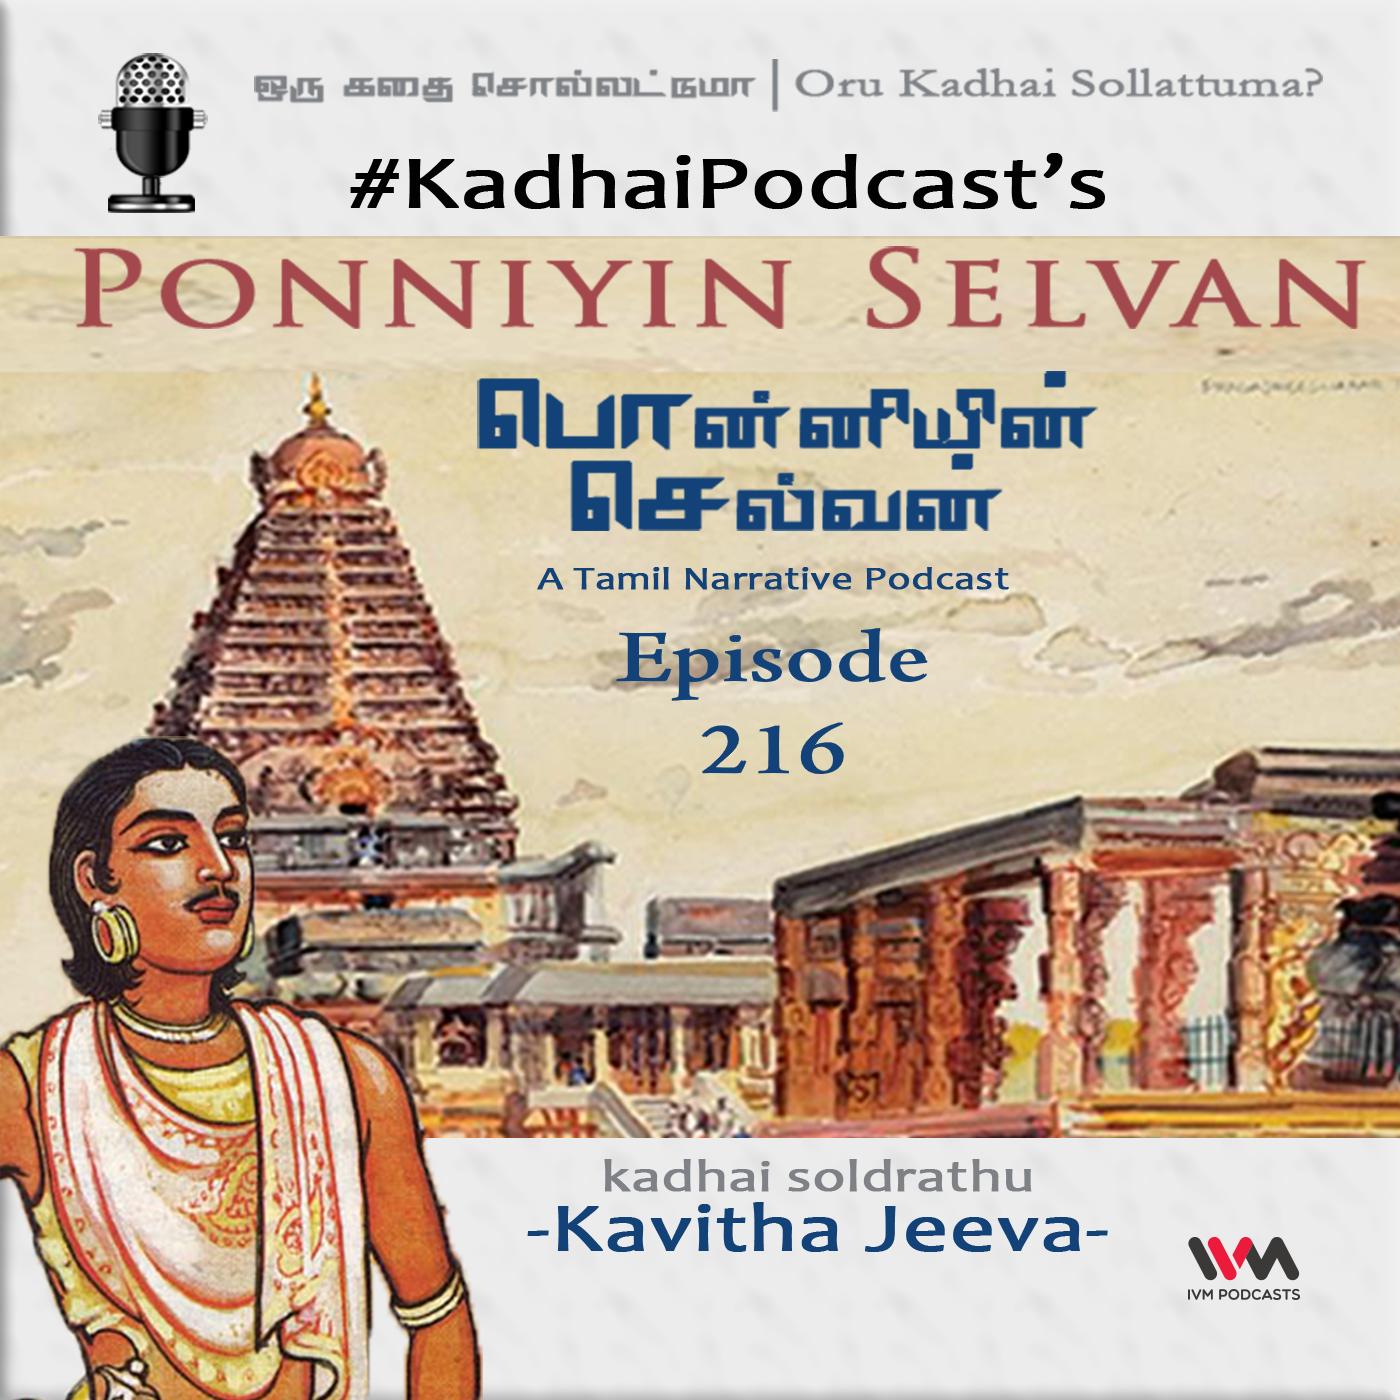 KadhaiPodcast's Ponniyin Selvan - Episode # 216